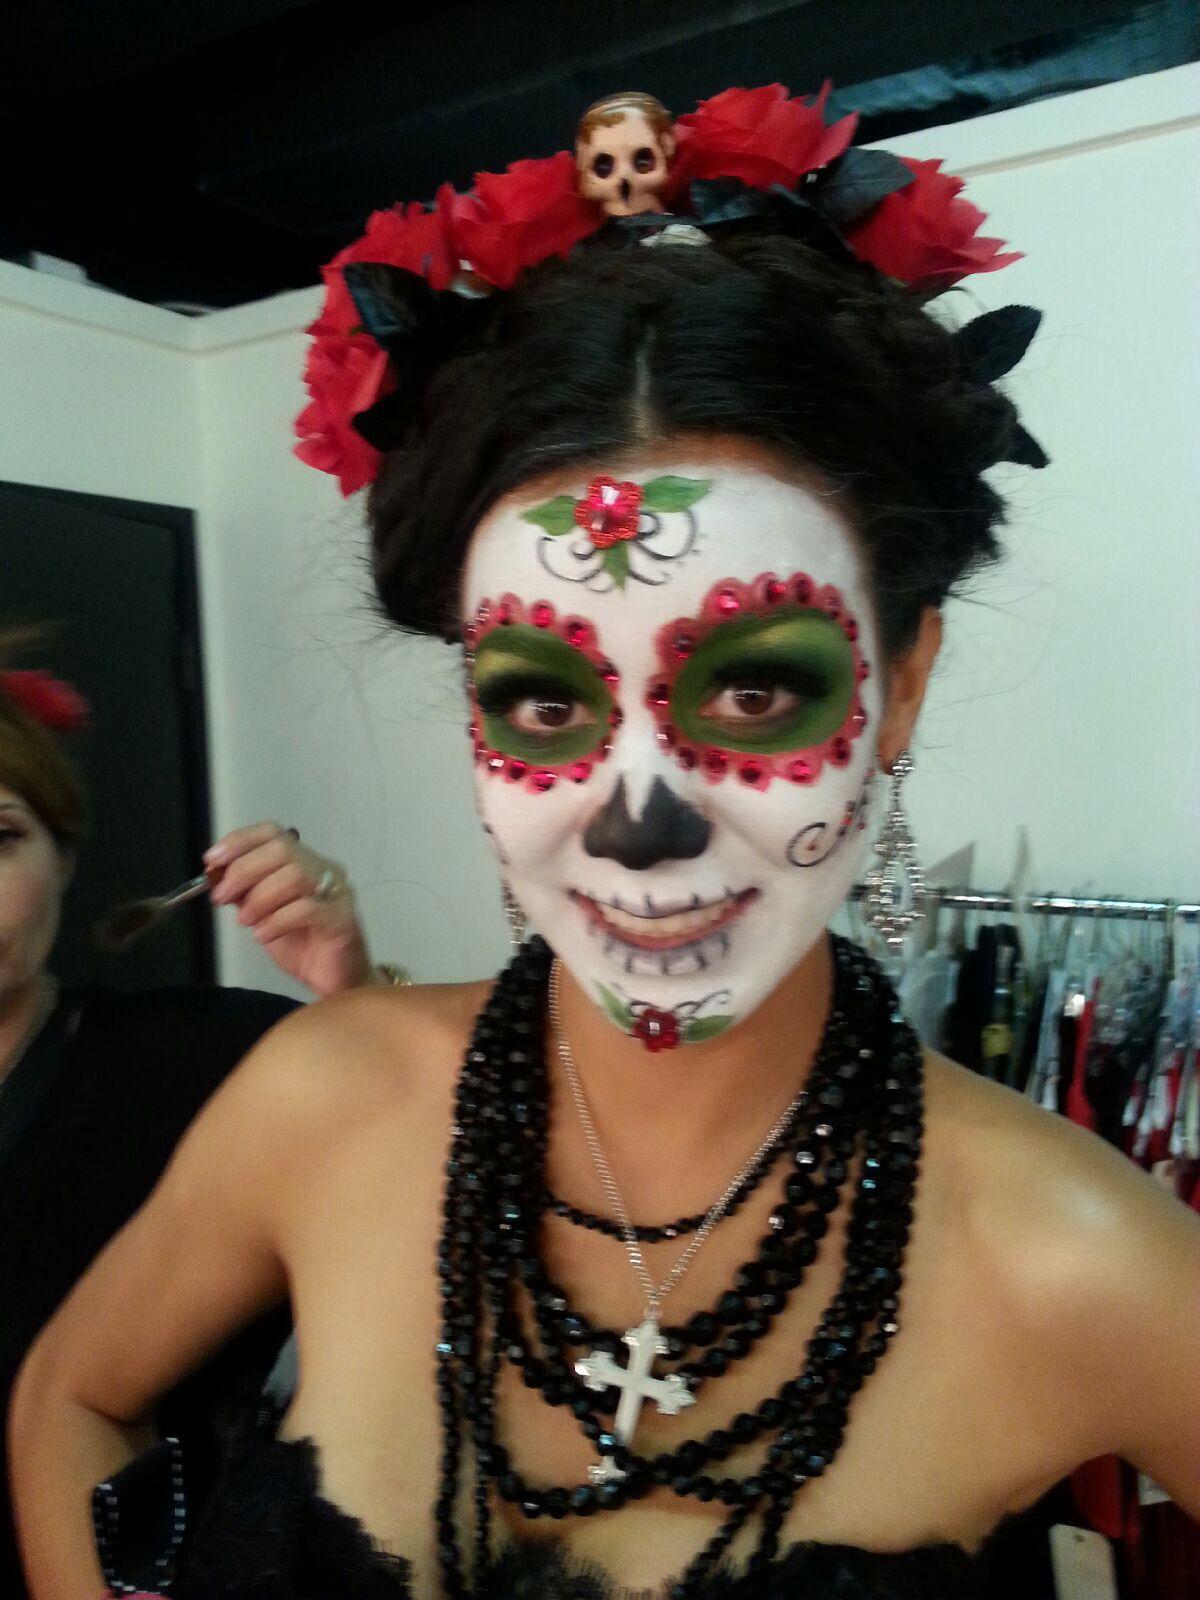 Pin By Emily Morrison Weeks On Makeup Inspiration Dia De Los Muertos Makeup Halloween Costumes For Girls Dia De Los Muertos